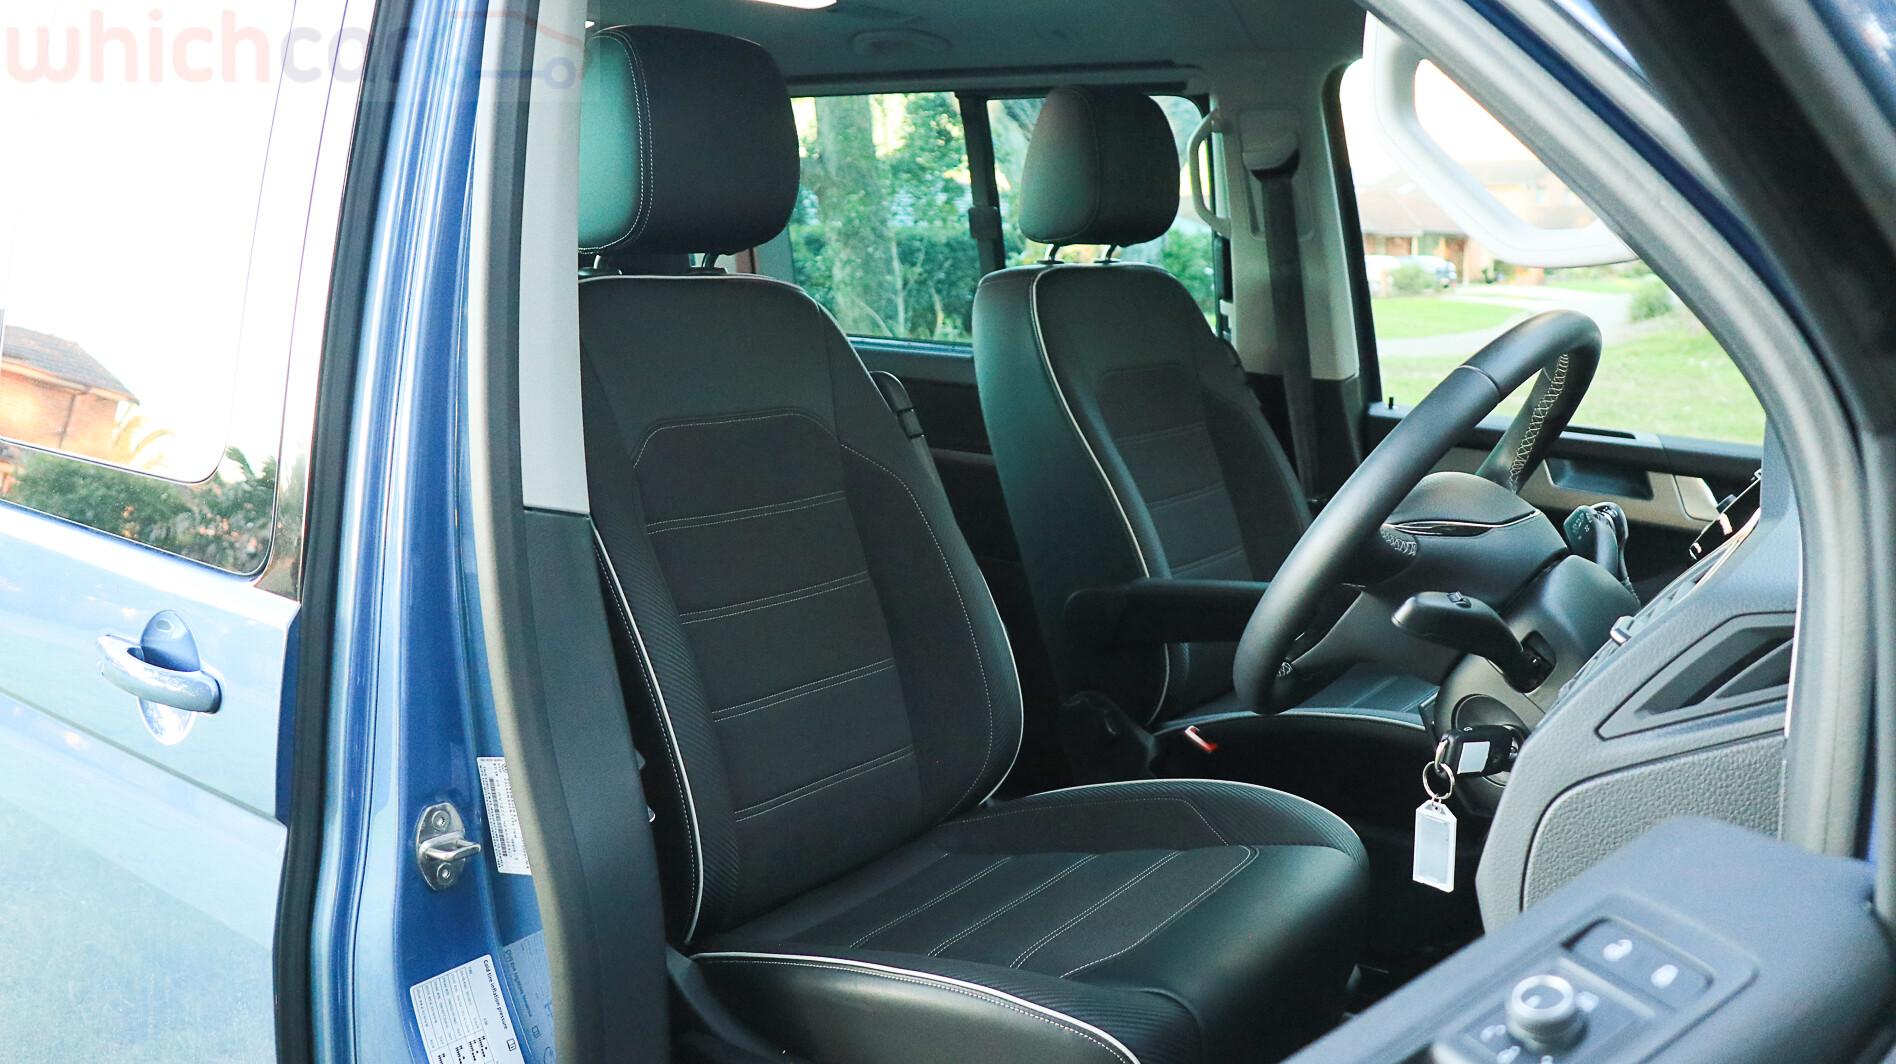 Volkswagen Multivan Black Edition 2019